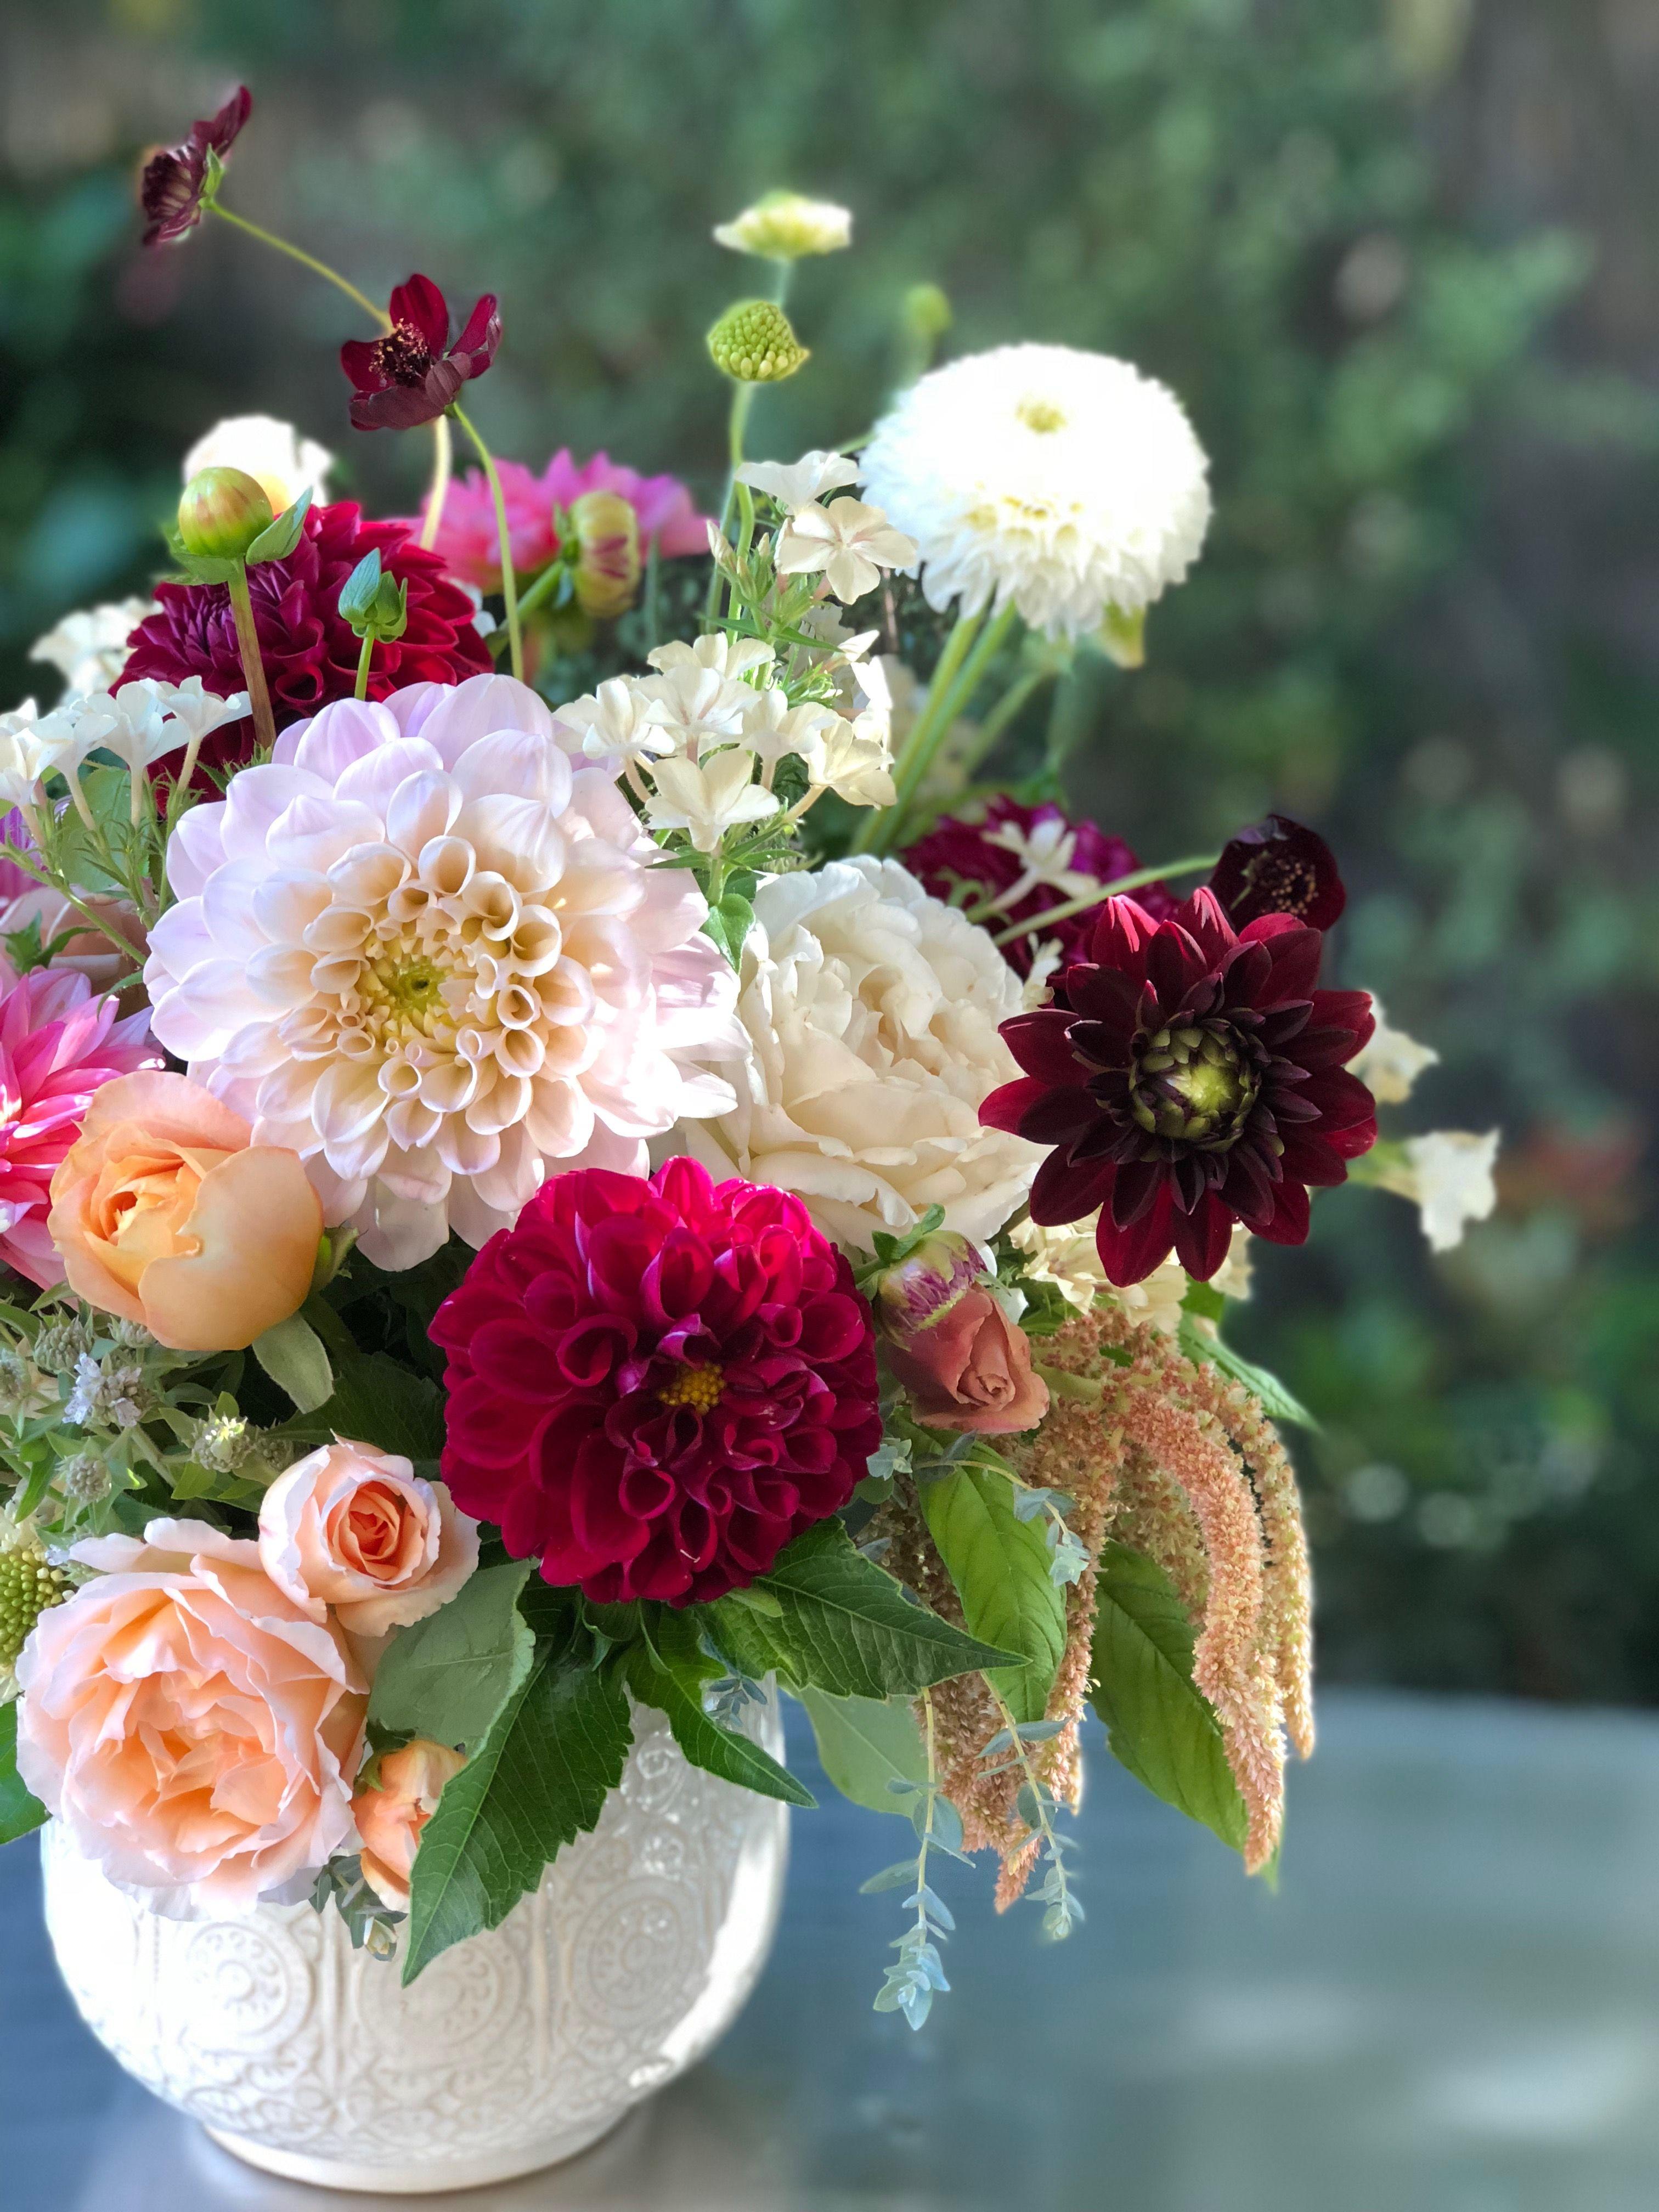 Fleurie Garden Grown Summertime Arrangement Of Dahlias Amaranthus Garden Roses Chocolate Cosmos Scabiosa And Mixe Flower Studio Flower Arrangements Flowers